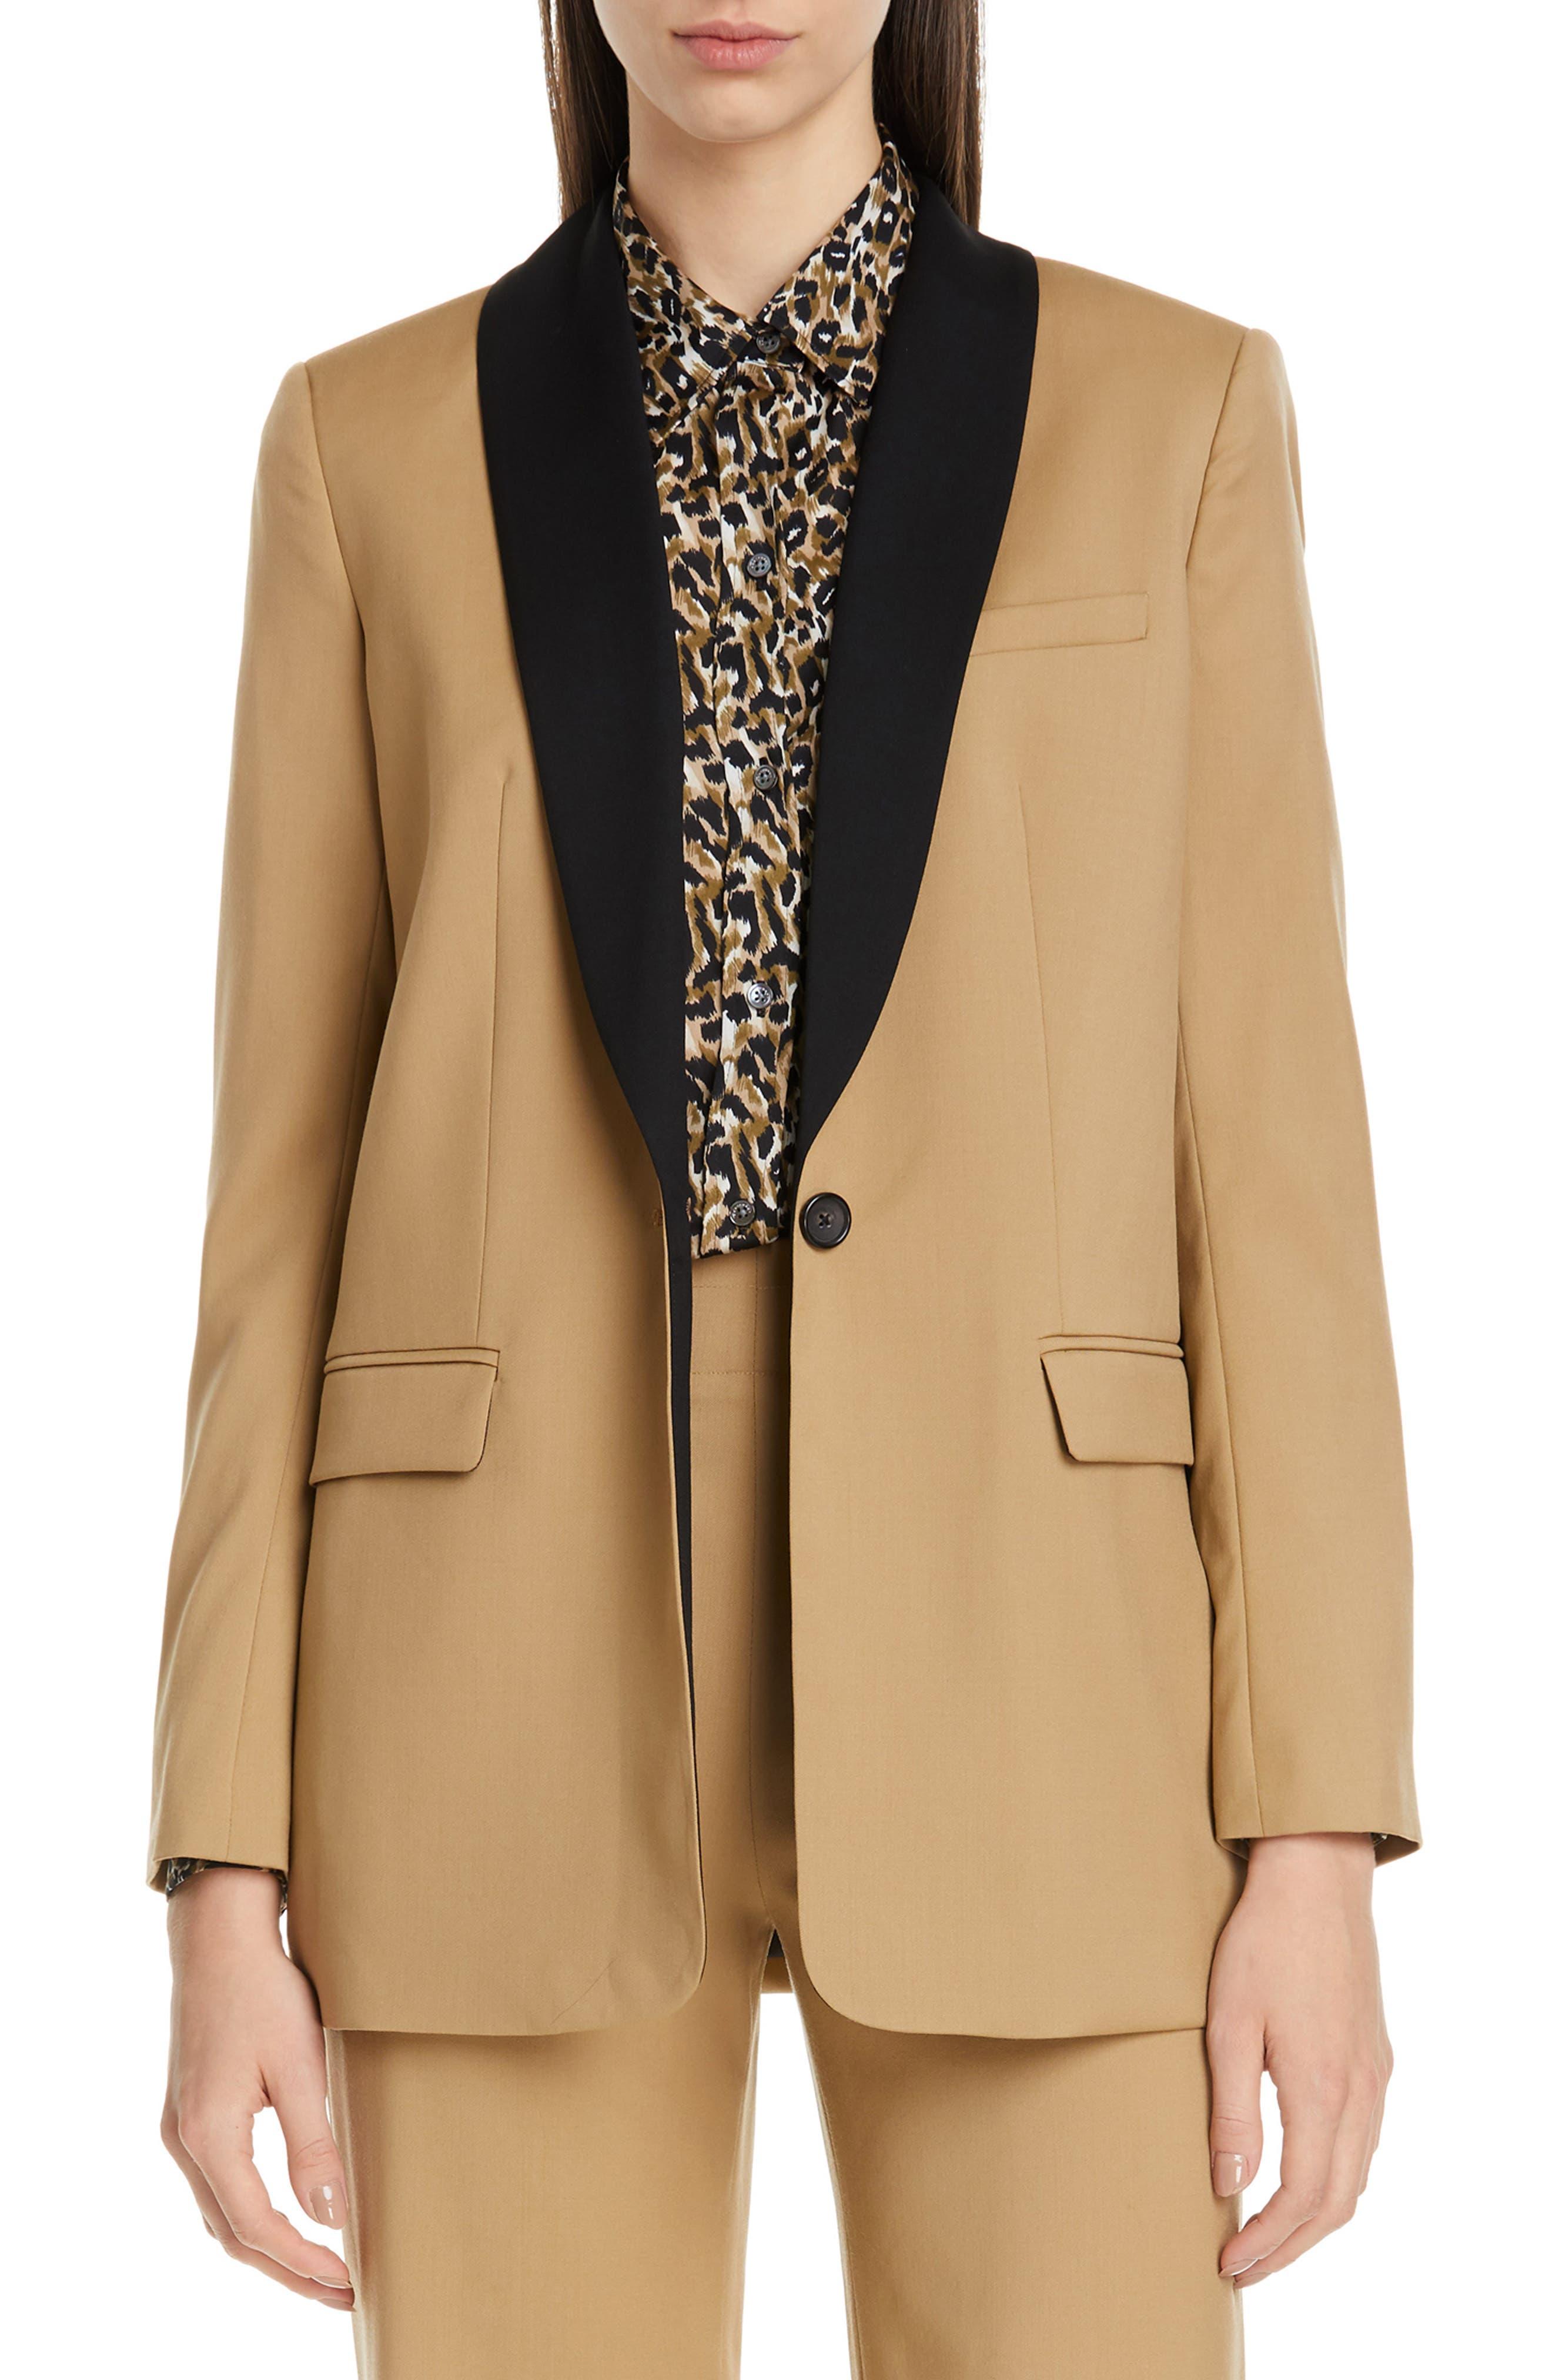 EQUIPMENT Quincy Shawl Collar Blazer, Main, color, BOIS